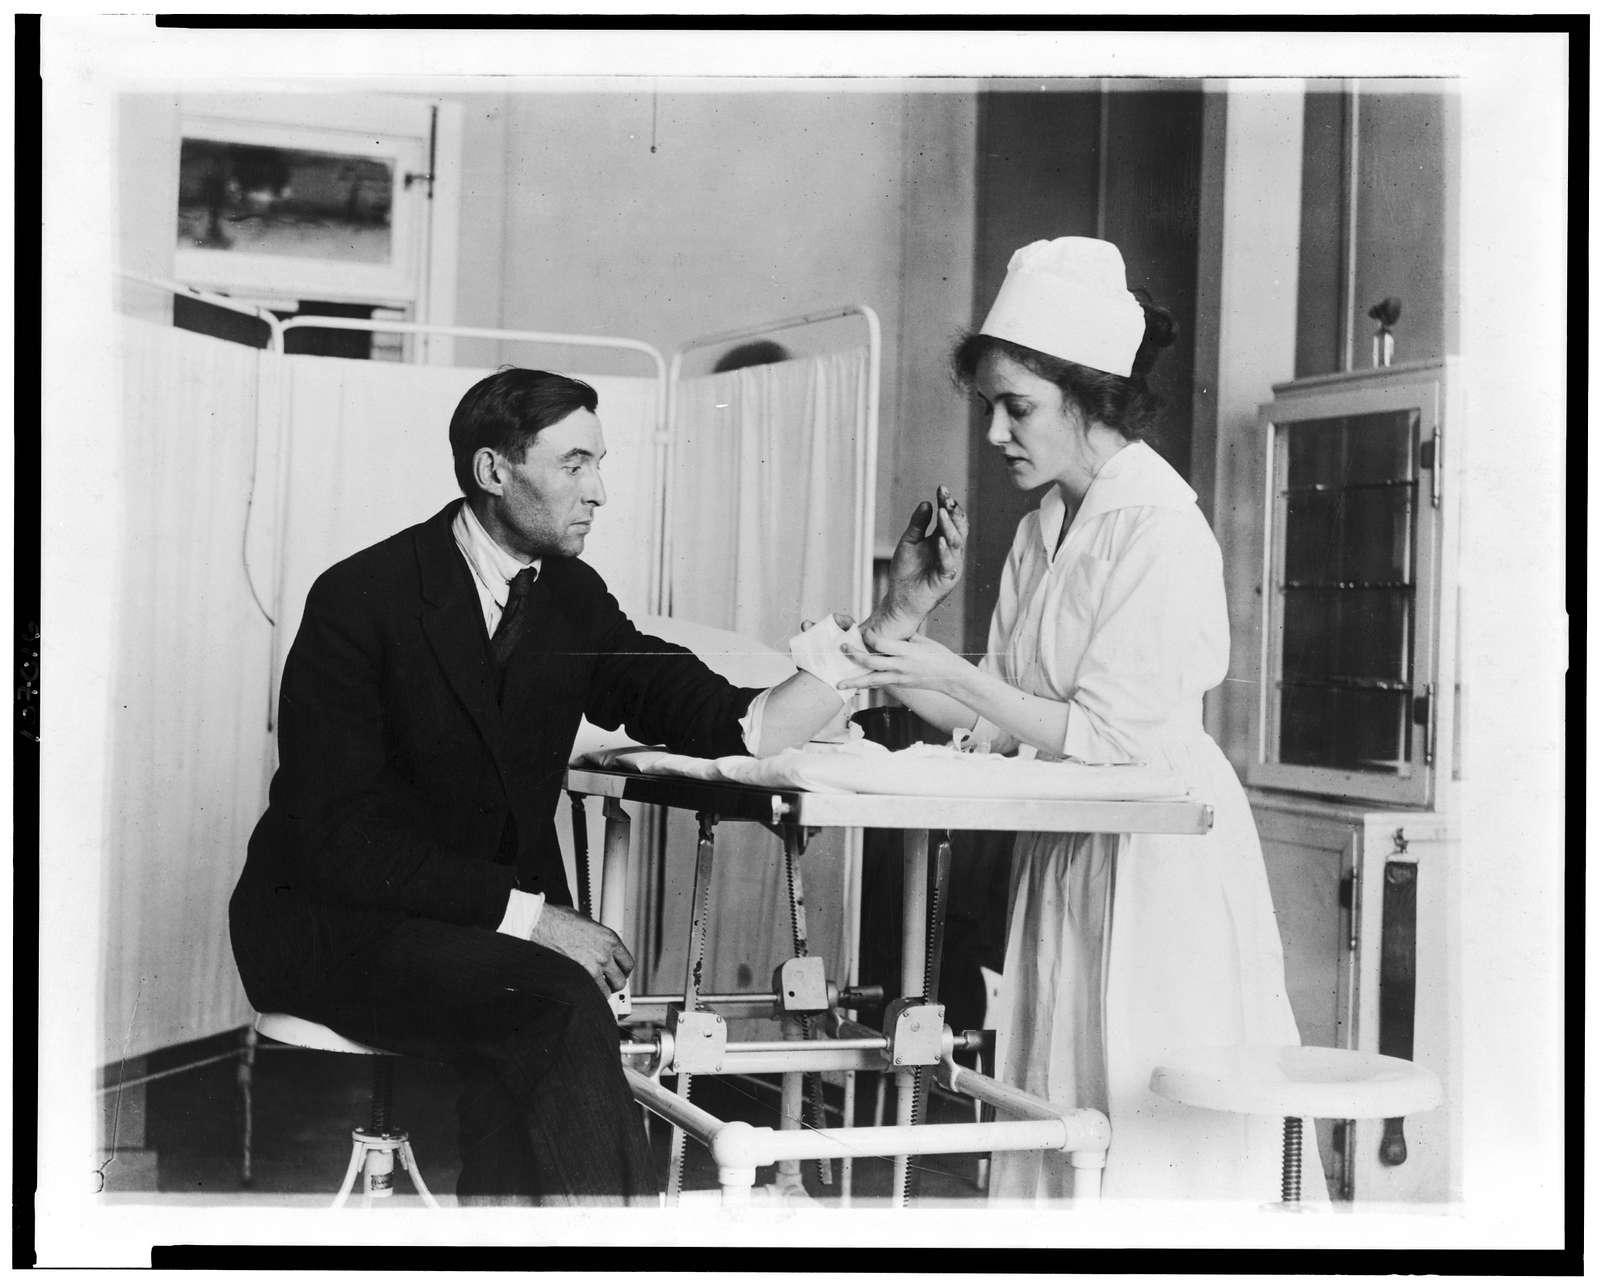 [Public Health Service nurse treating patient]